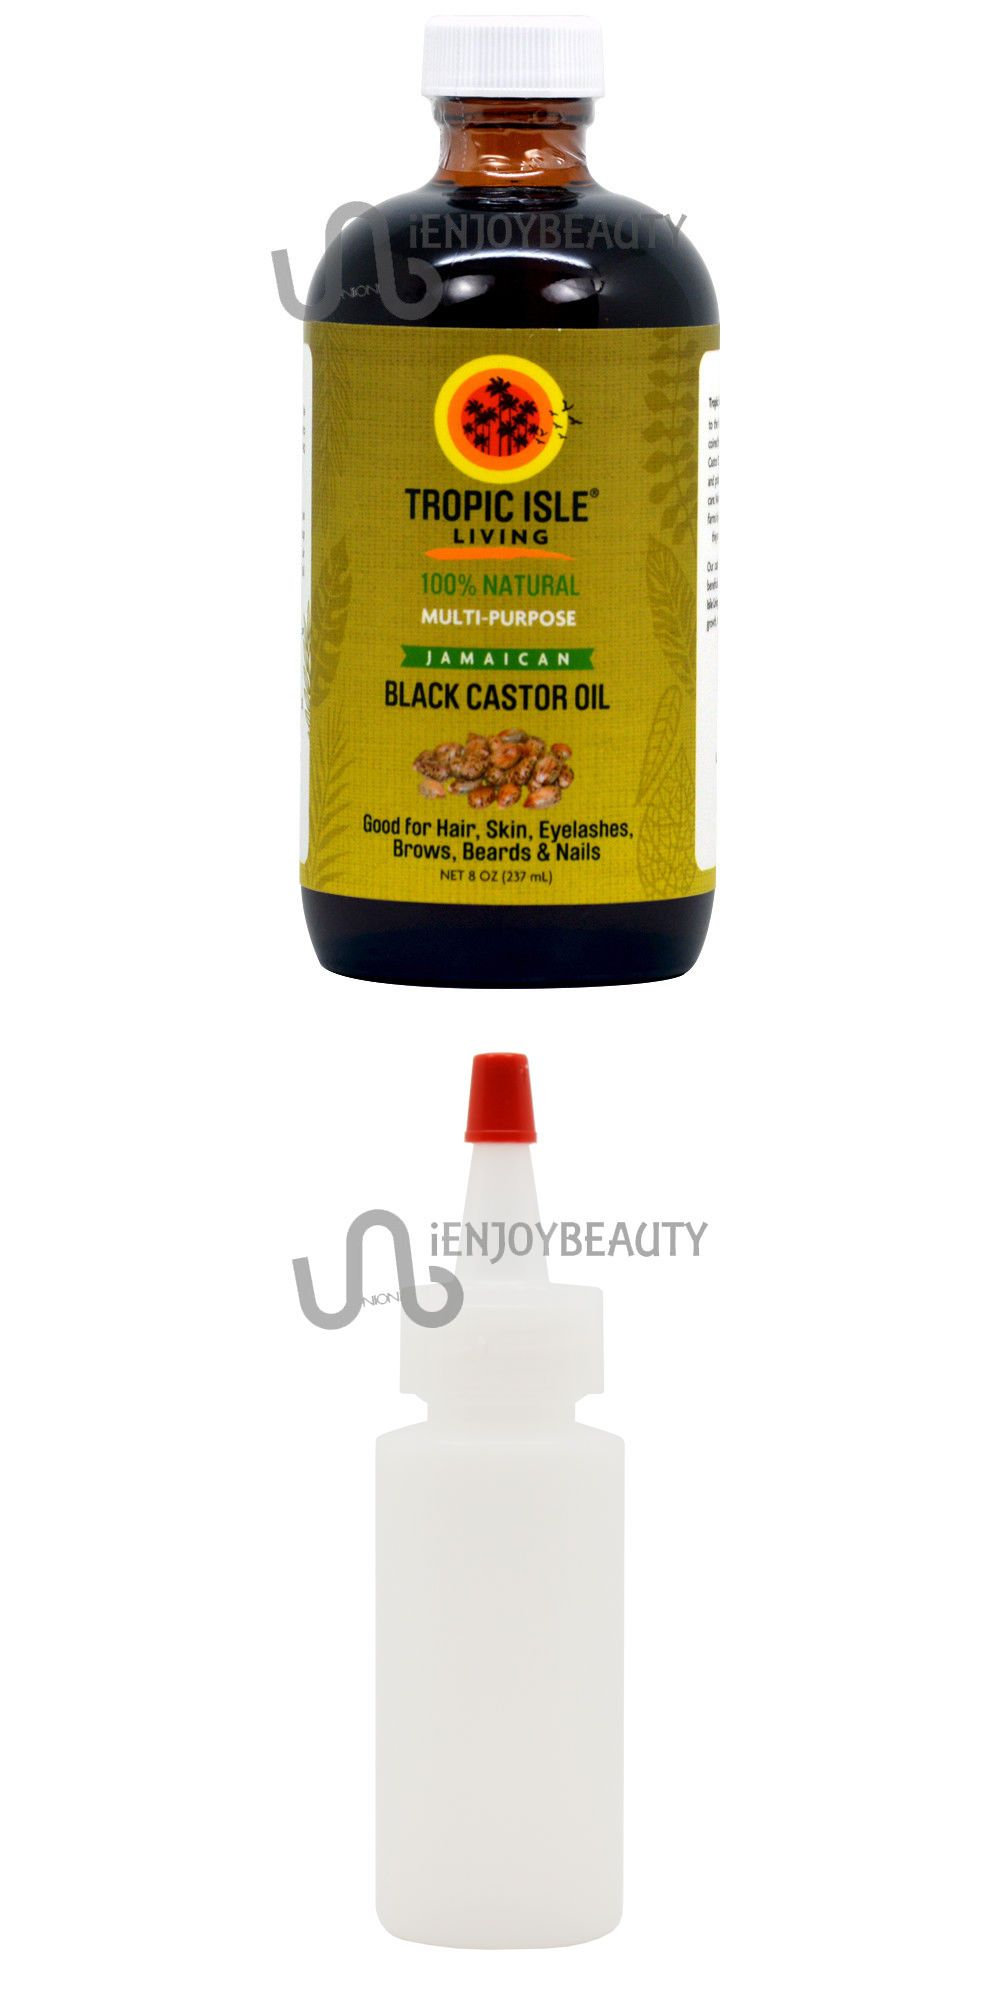 Tropic Isle Living Jamaican Black Castor Oil oz Glass Bottle Free